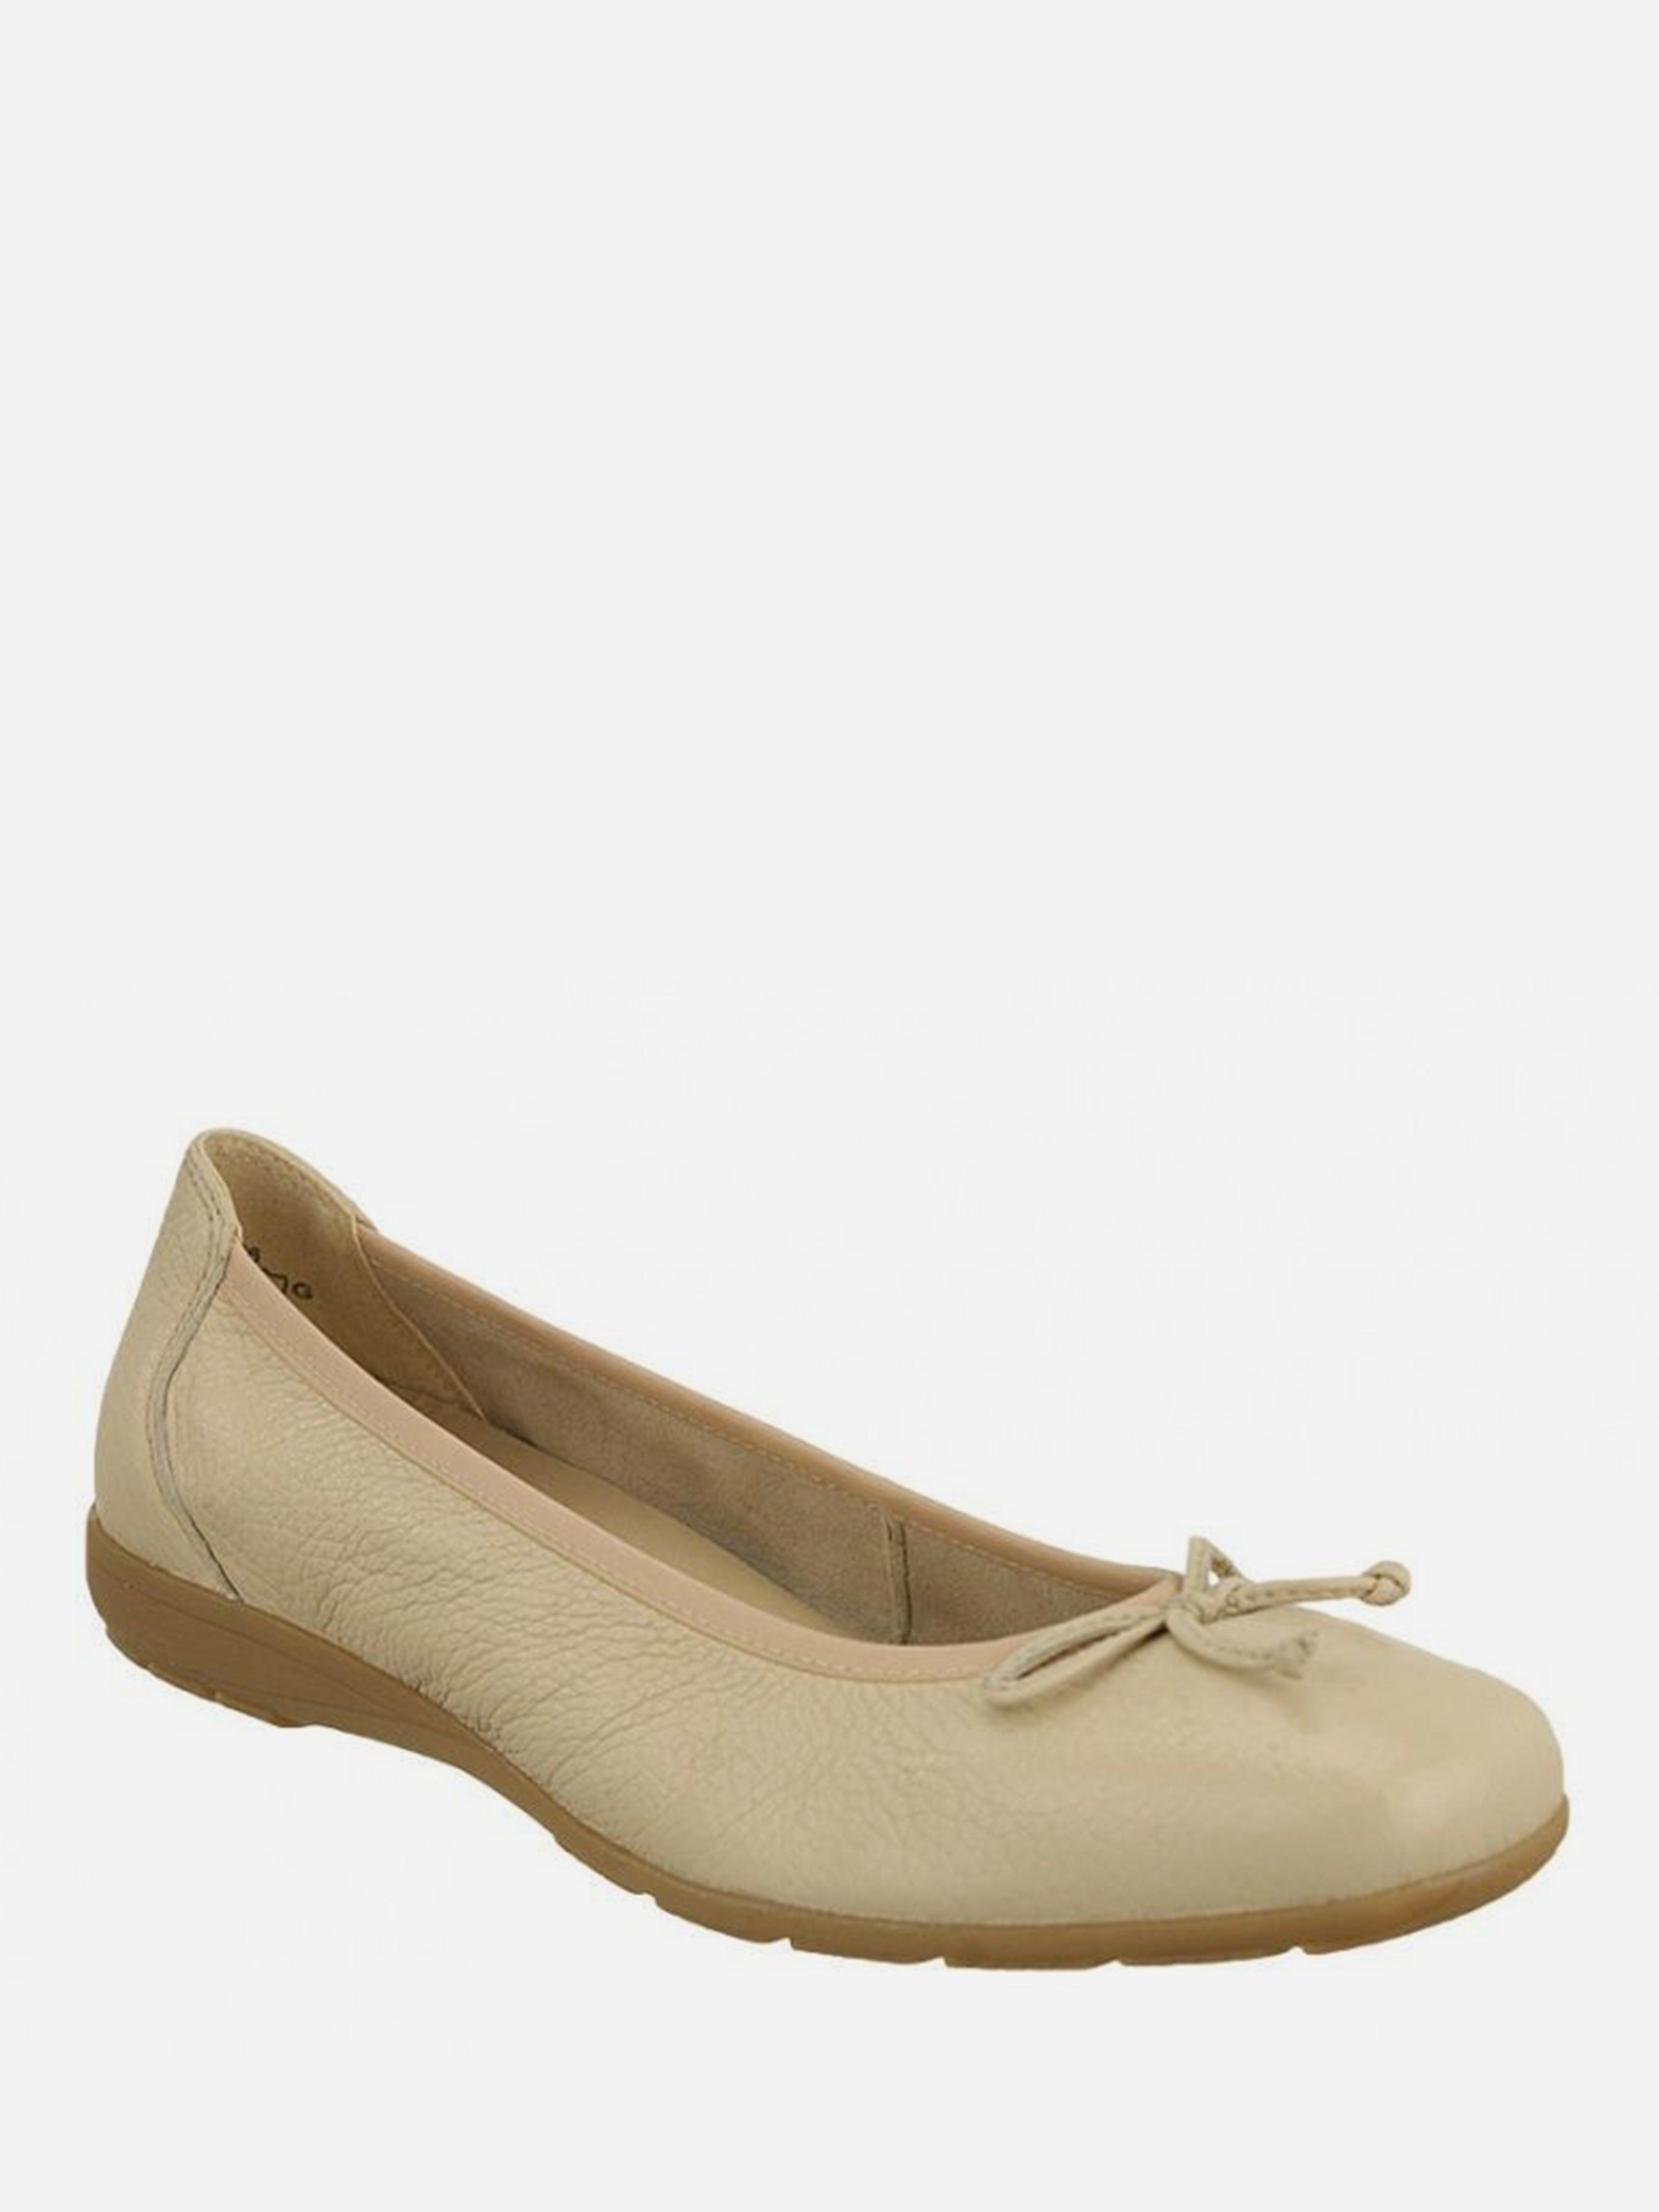 Балетки для женщин Caprice EO202 размеры обуви, 2017